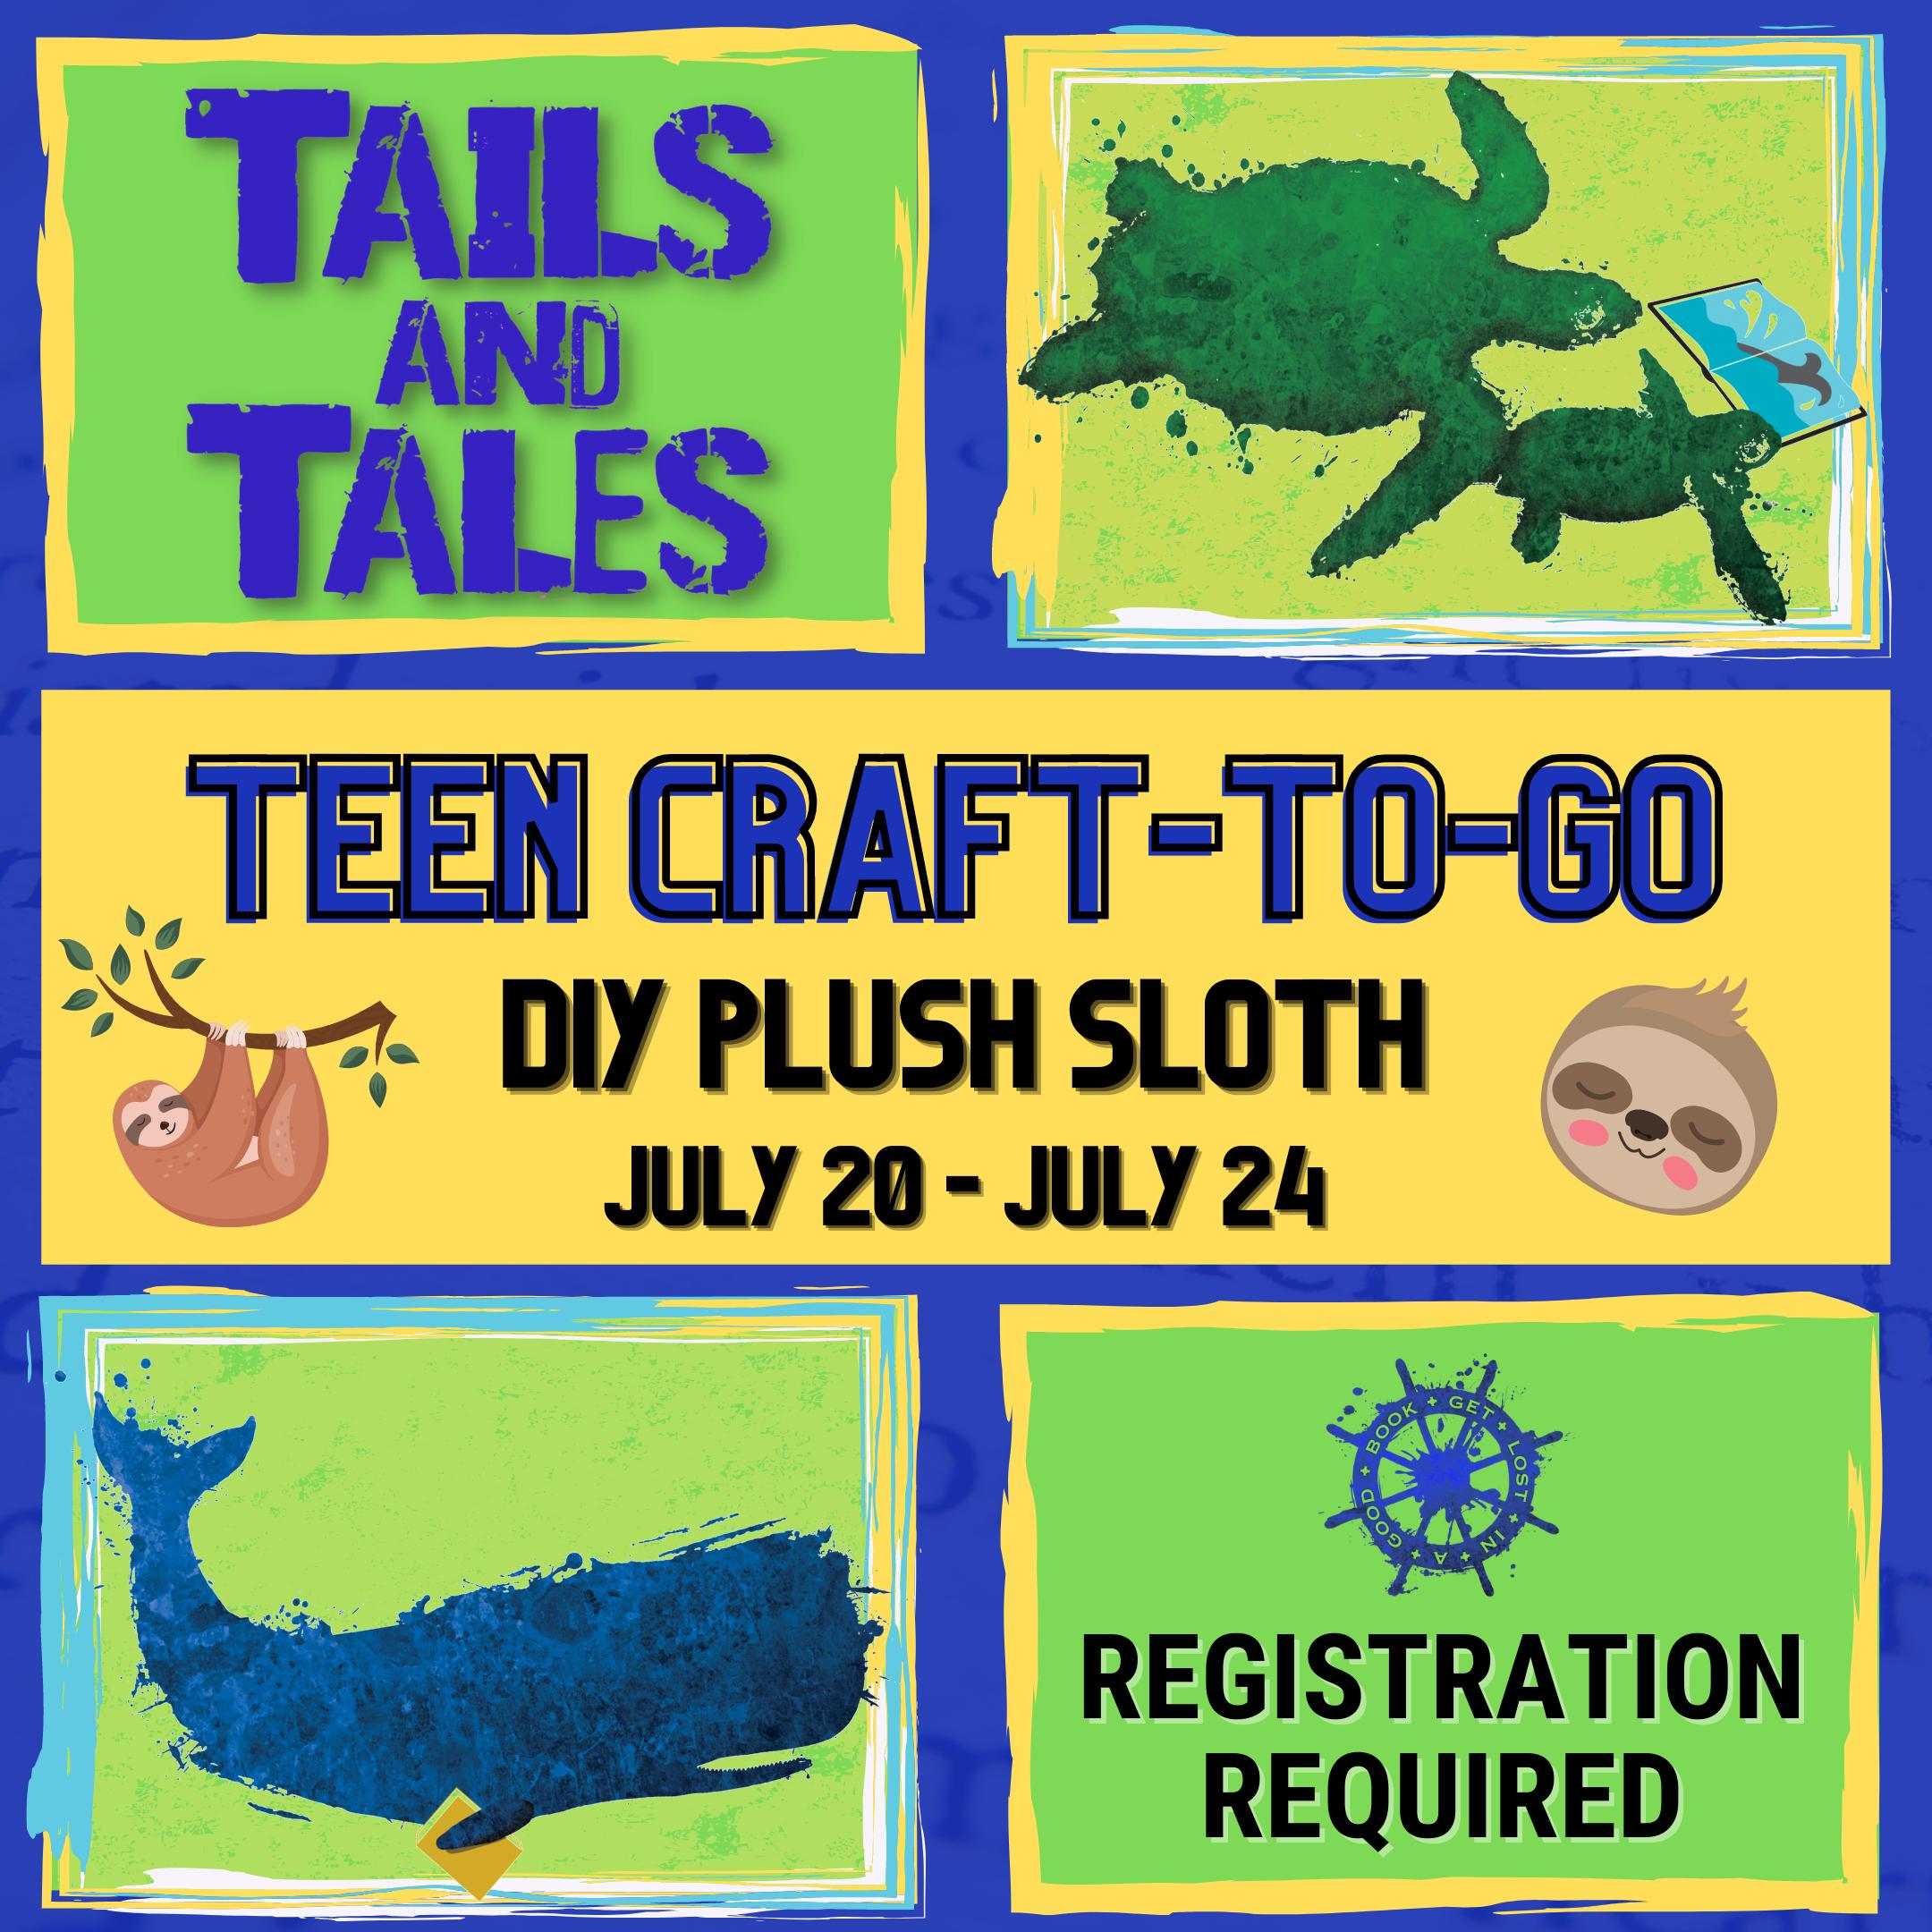 Teen Craft-To-Go: DIY Plush Sloth